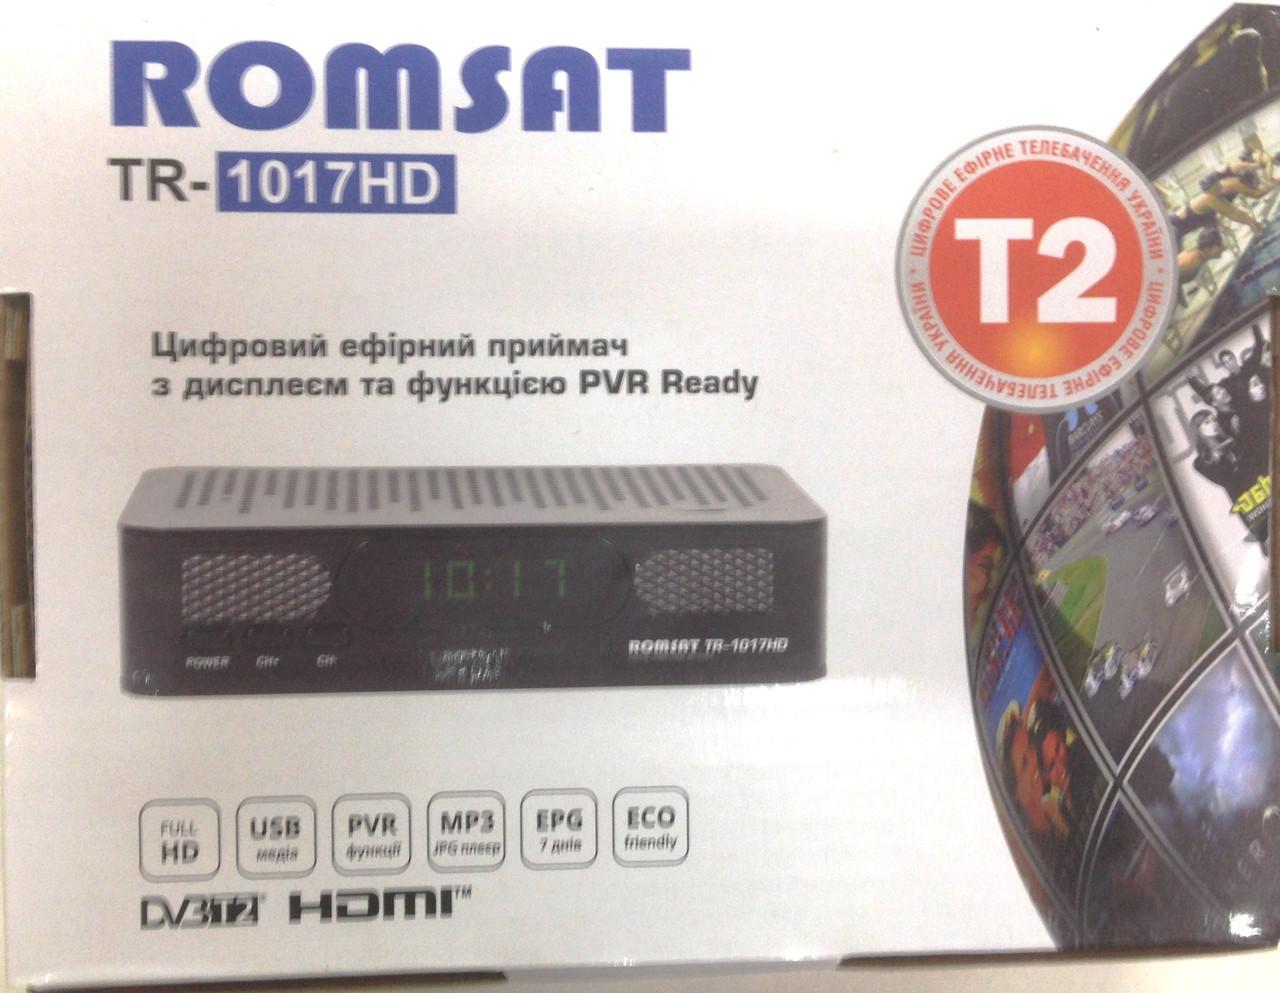 ТВ-ресивер DVB-T2 Romsat TR-1017HD тюнер